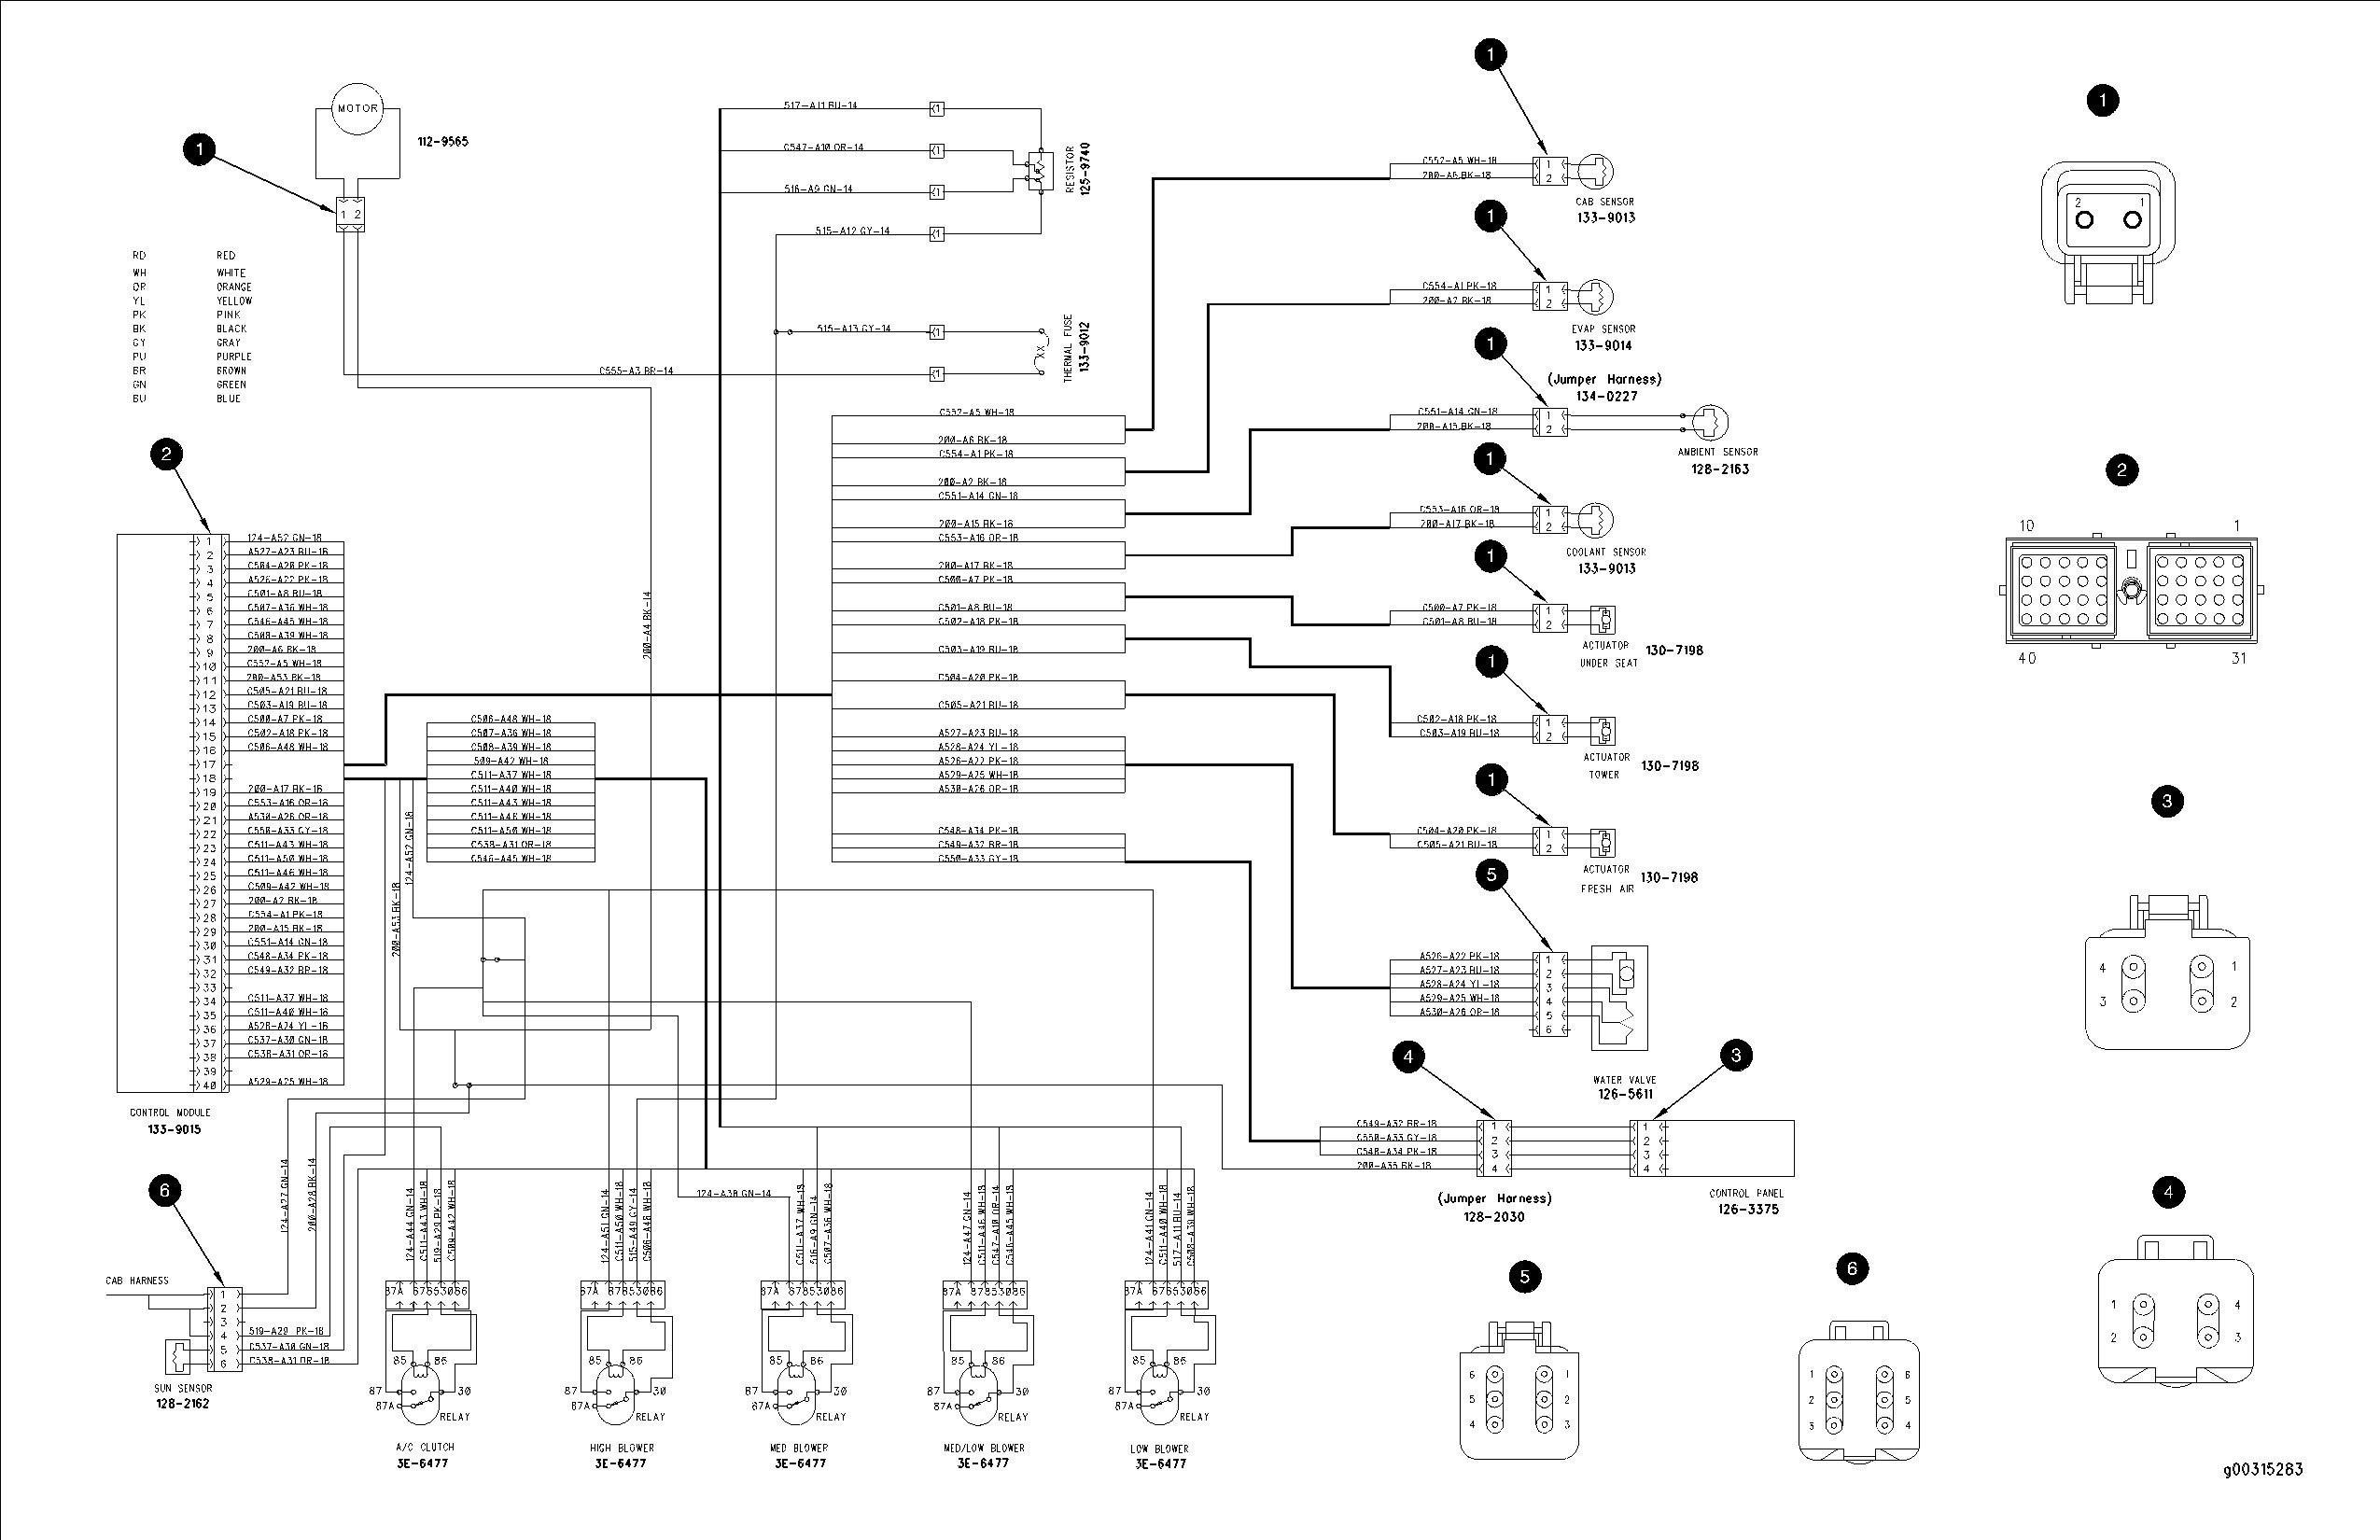 HX_1552] Caterpillar Wiring Diagram Plugs Wiring DiagramUnec Gritea Phae Mohammedshrine Librar Wiring 101